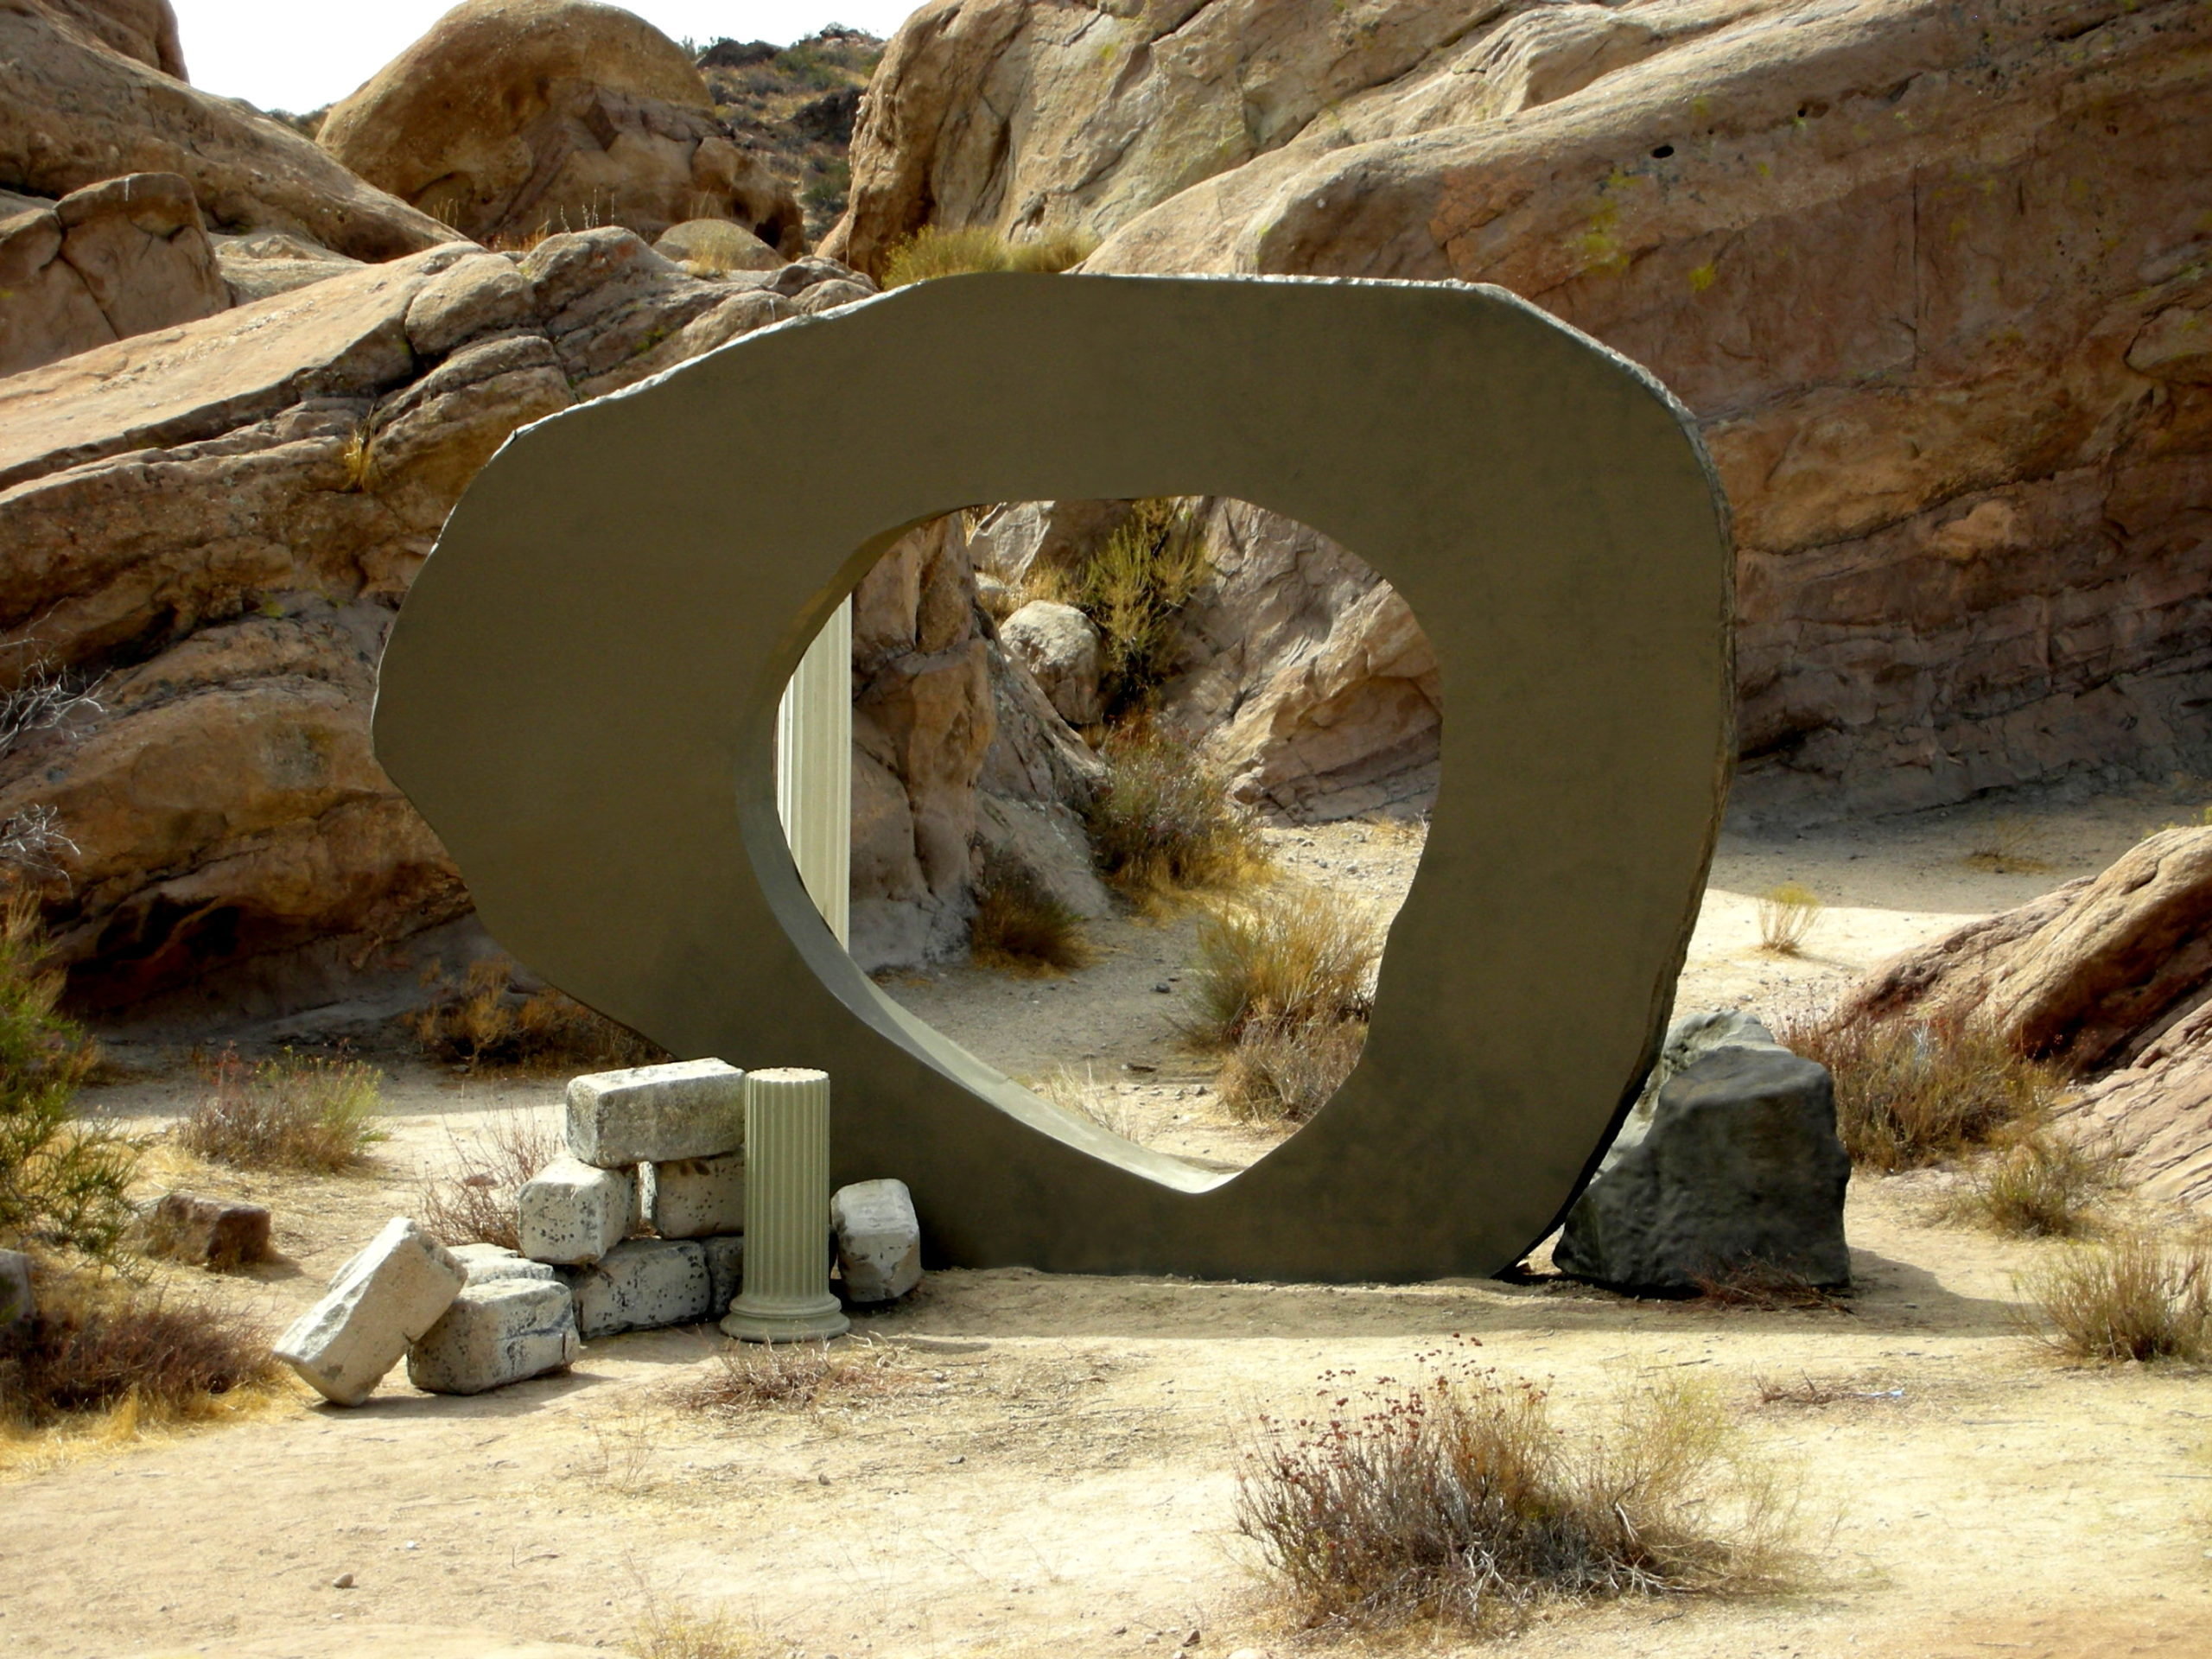 Guardian of Forever replica, Vasquez Rock Park